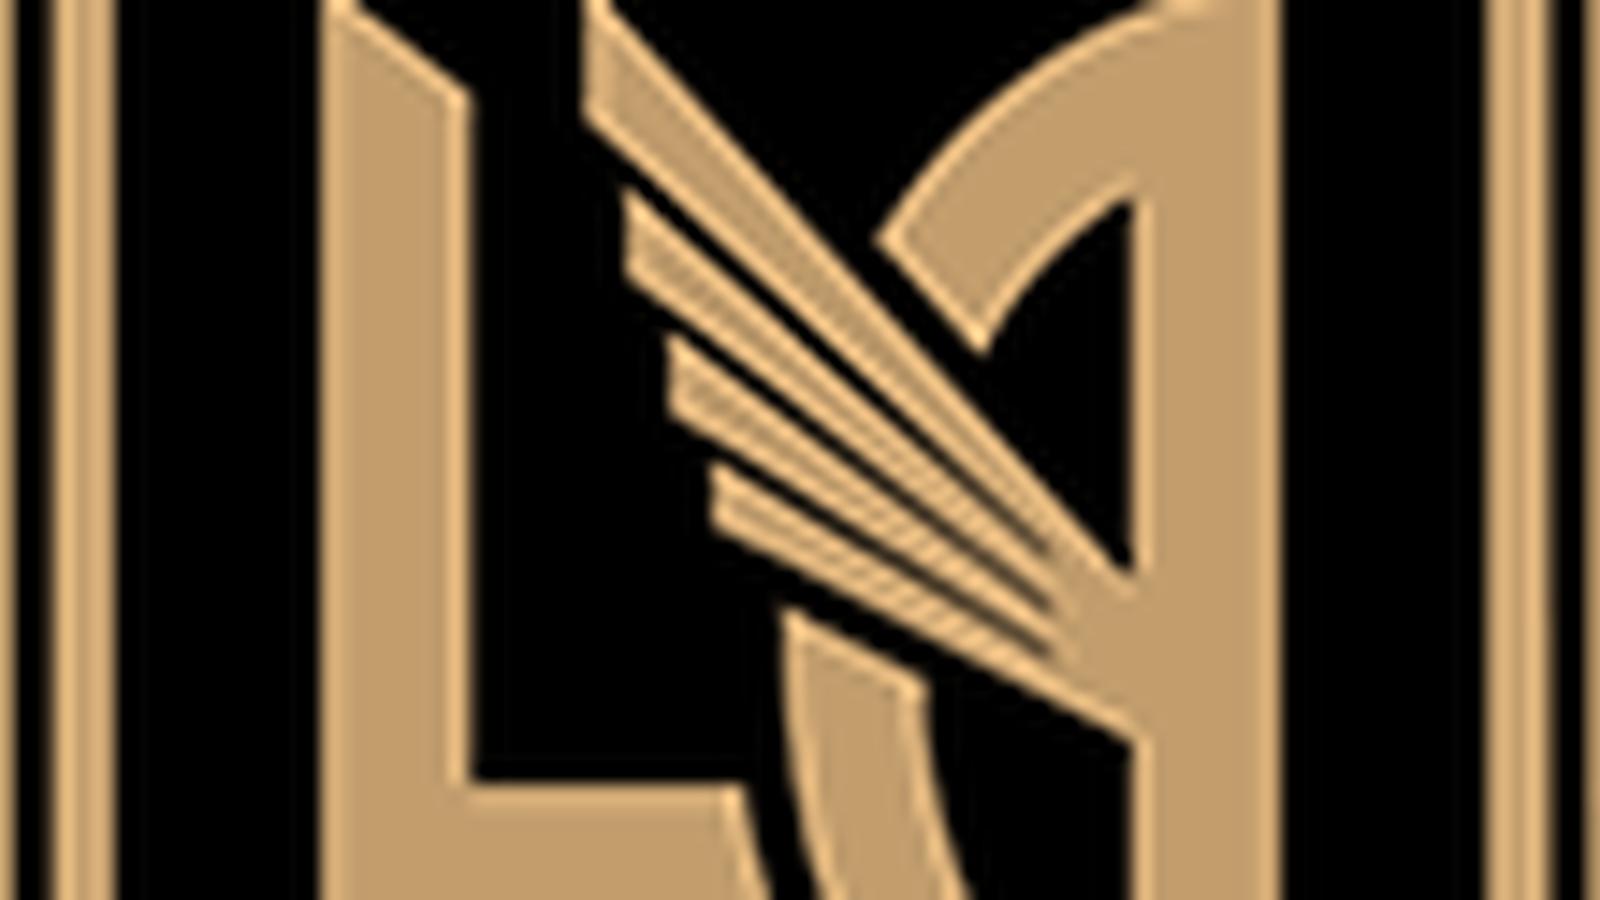 Lafc-150px.0.0